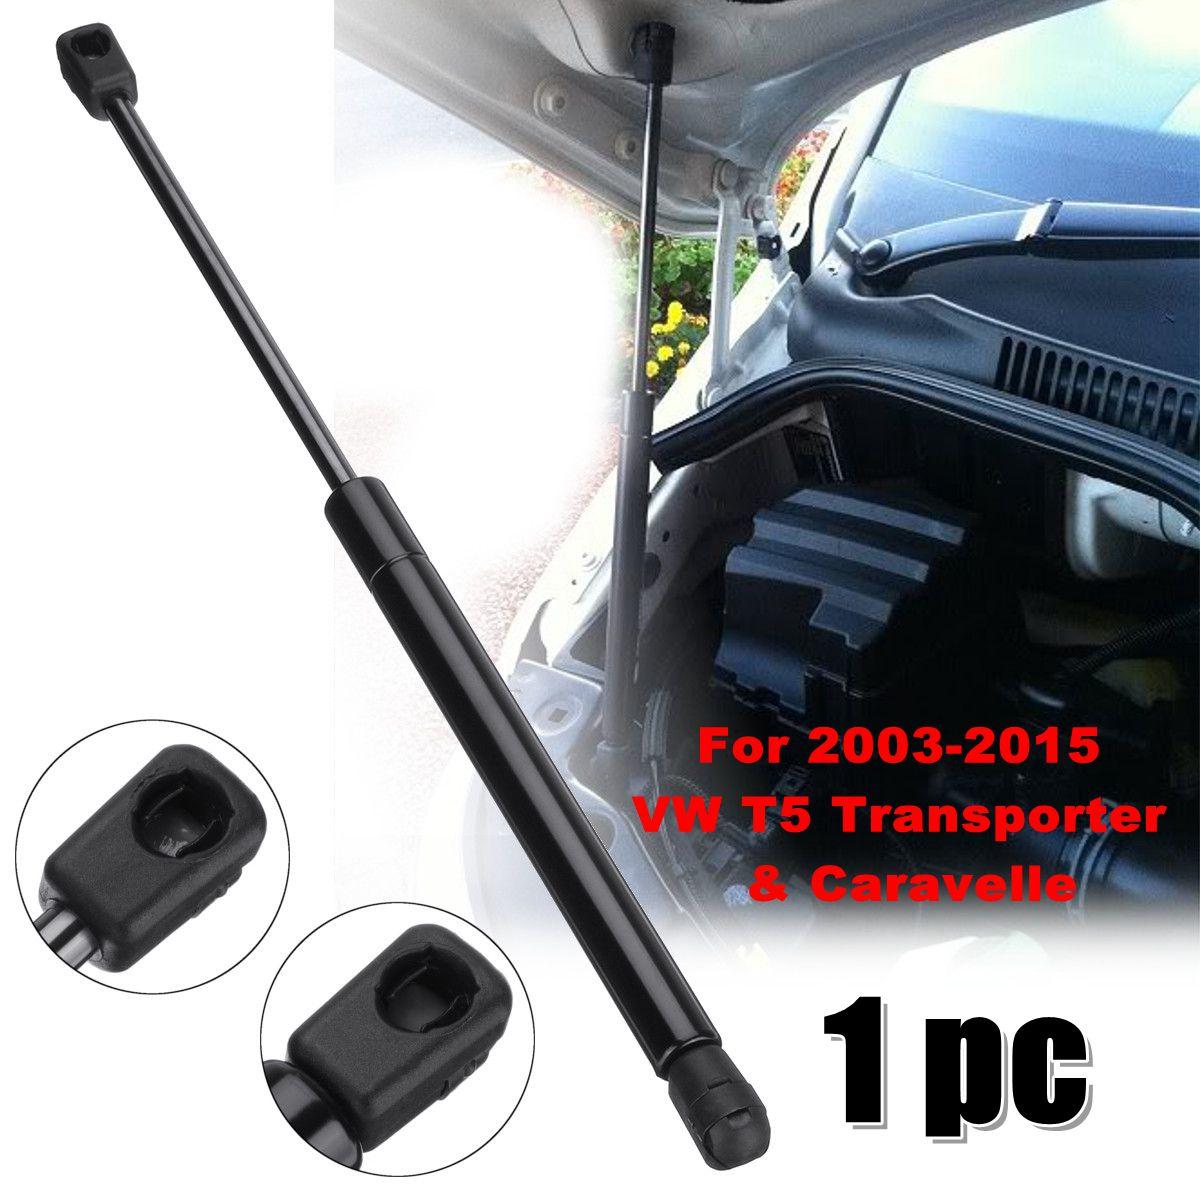 1Pc Front Bonnet Hood Support Gas Strut For VW T5 Transporter & Caravelle 2003-2015 7E0823359